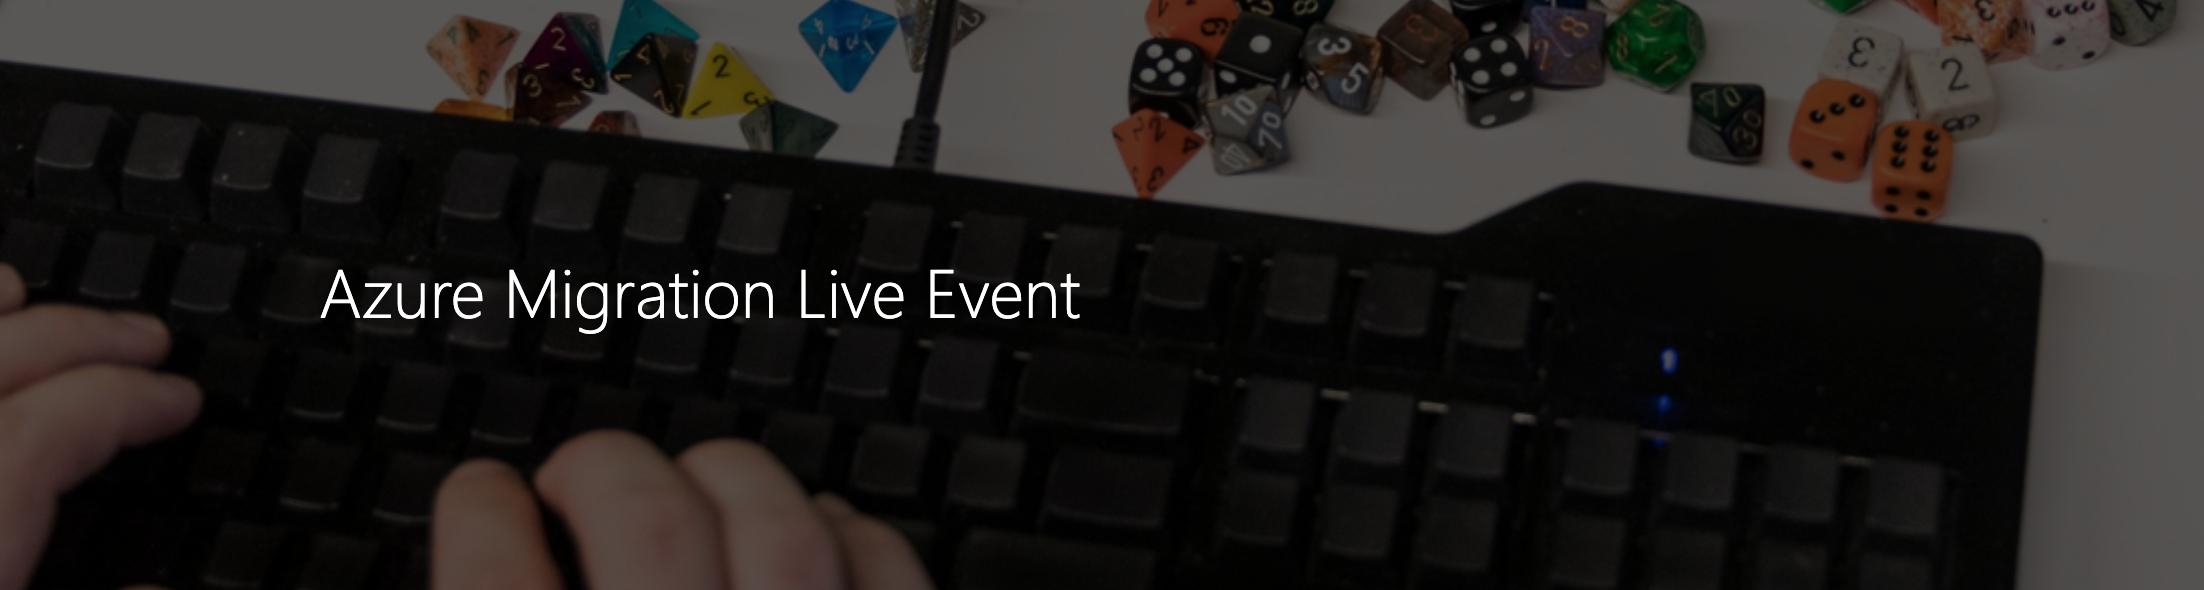 Microsoft Azure Migration Live Event